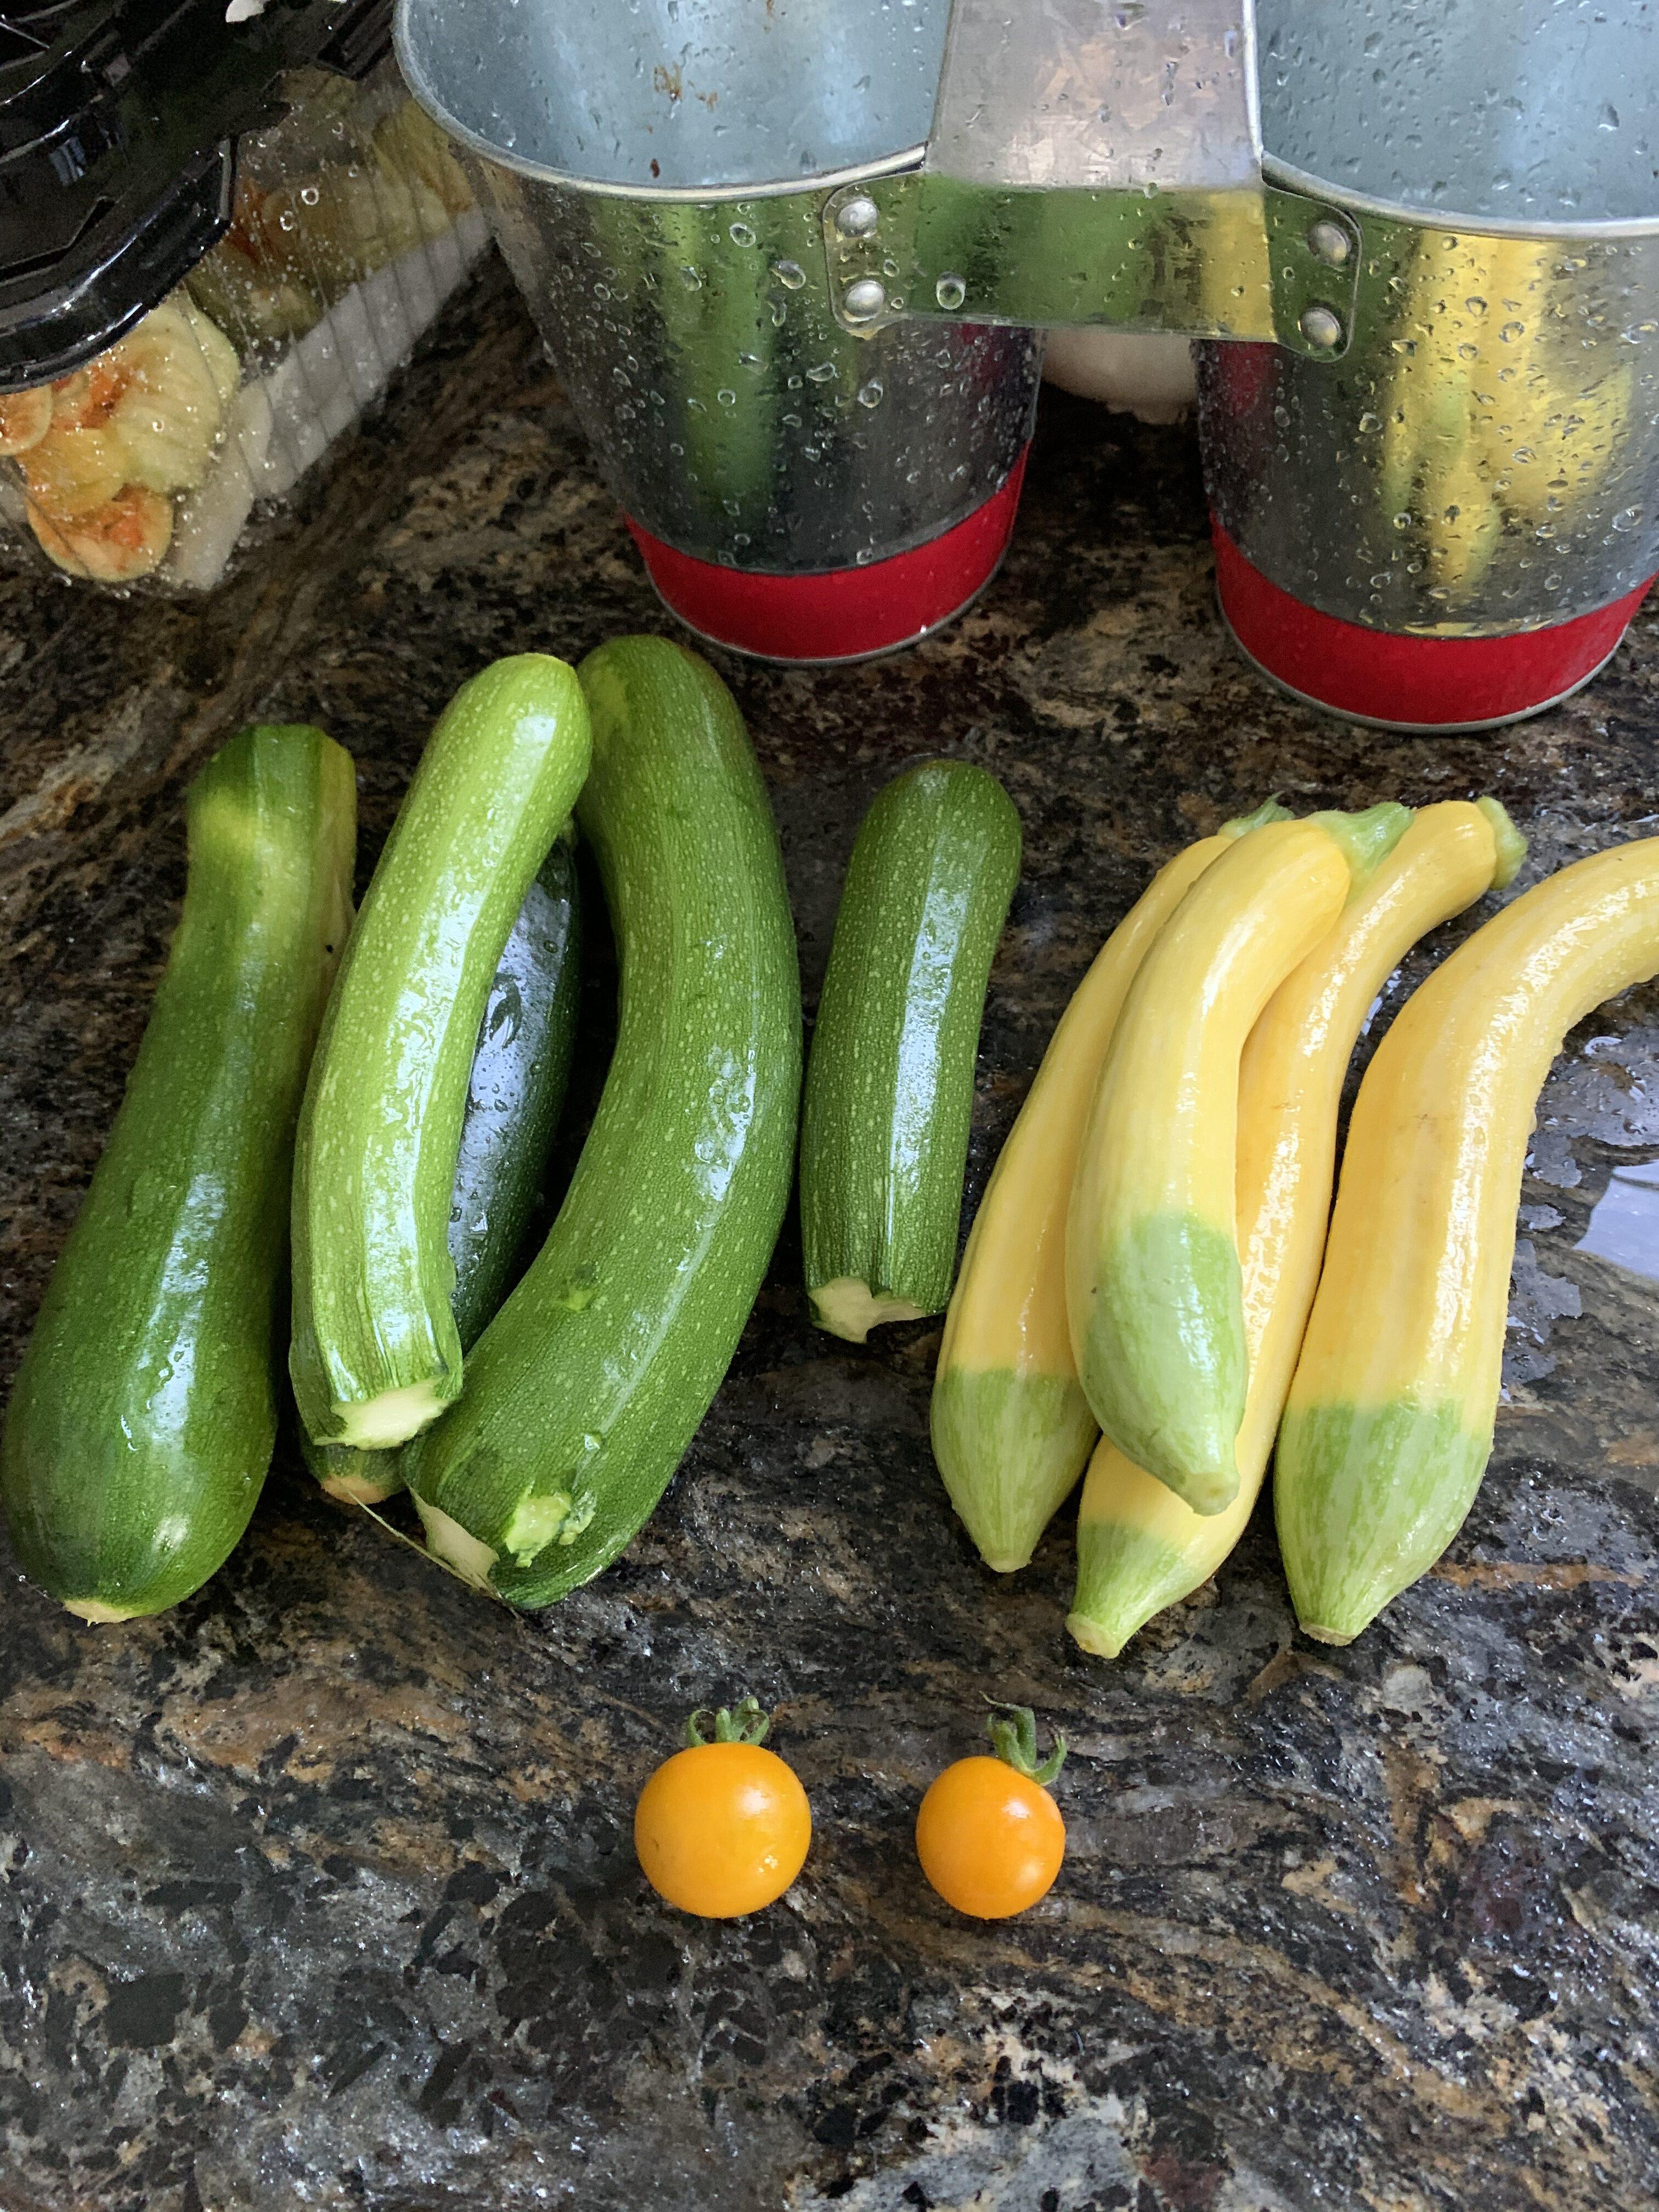 CE7F3691 E40F 4756 9B6B 3AF56B71C8D9 Can you have too many tomato plants?